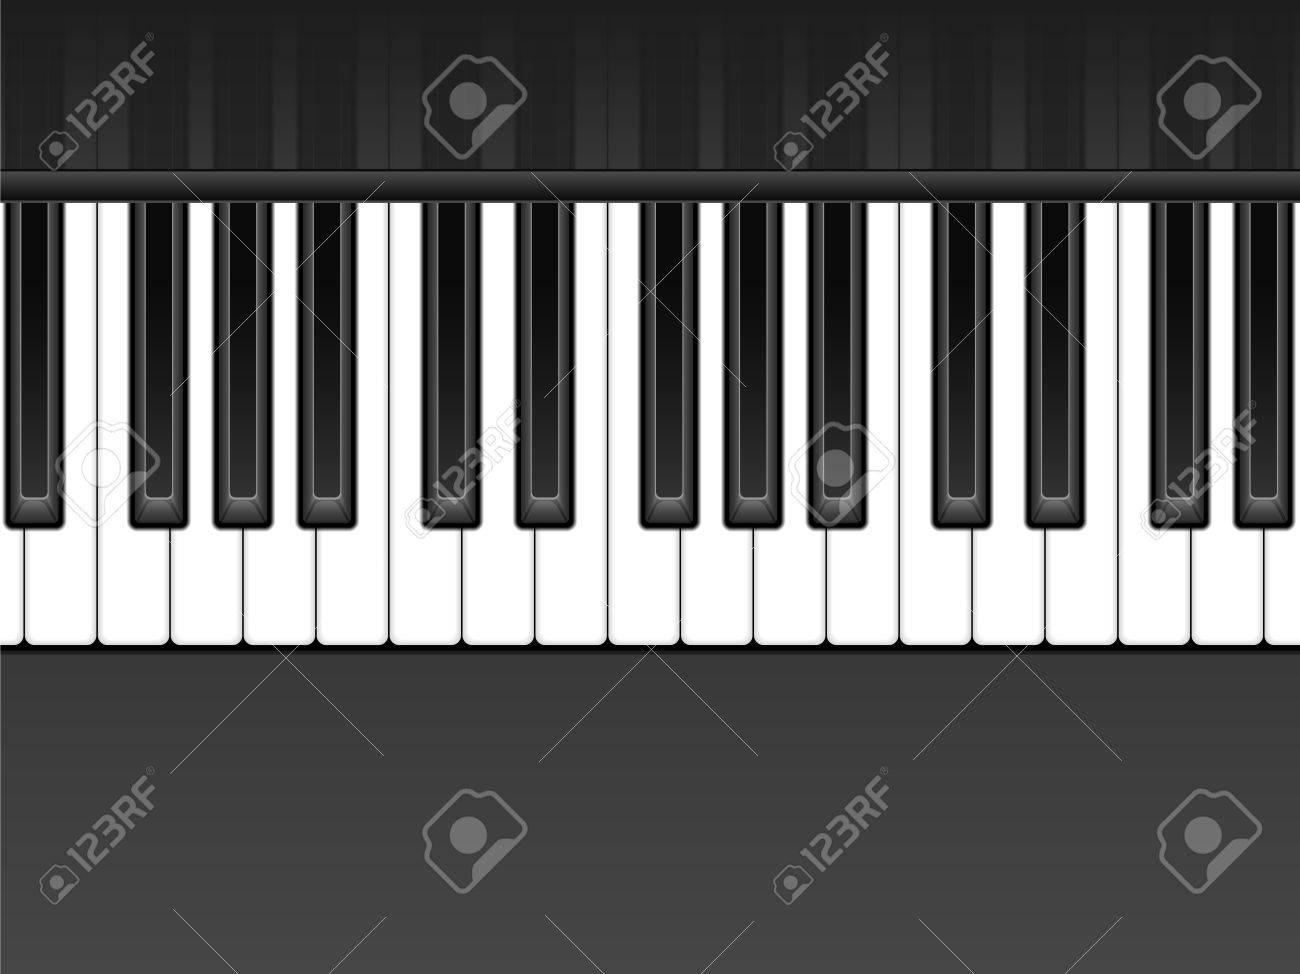 Piano Black Background Black And White Piano Keyboard